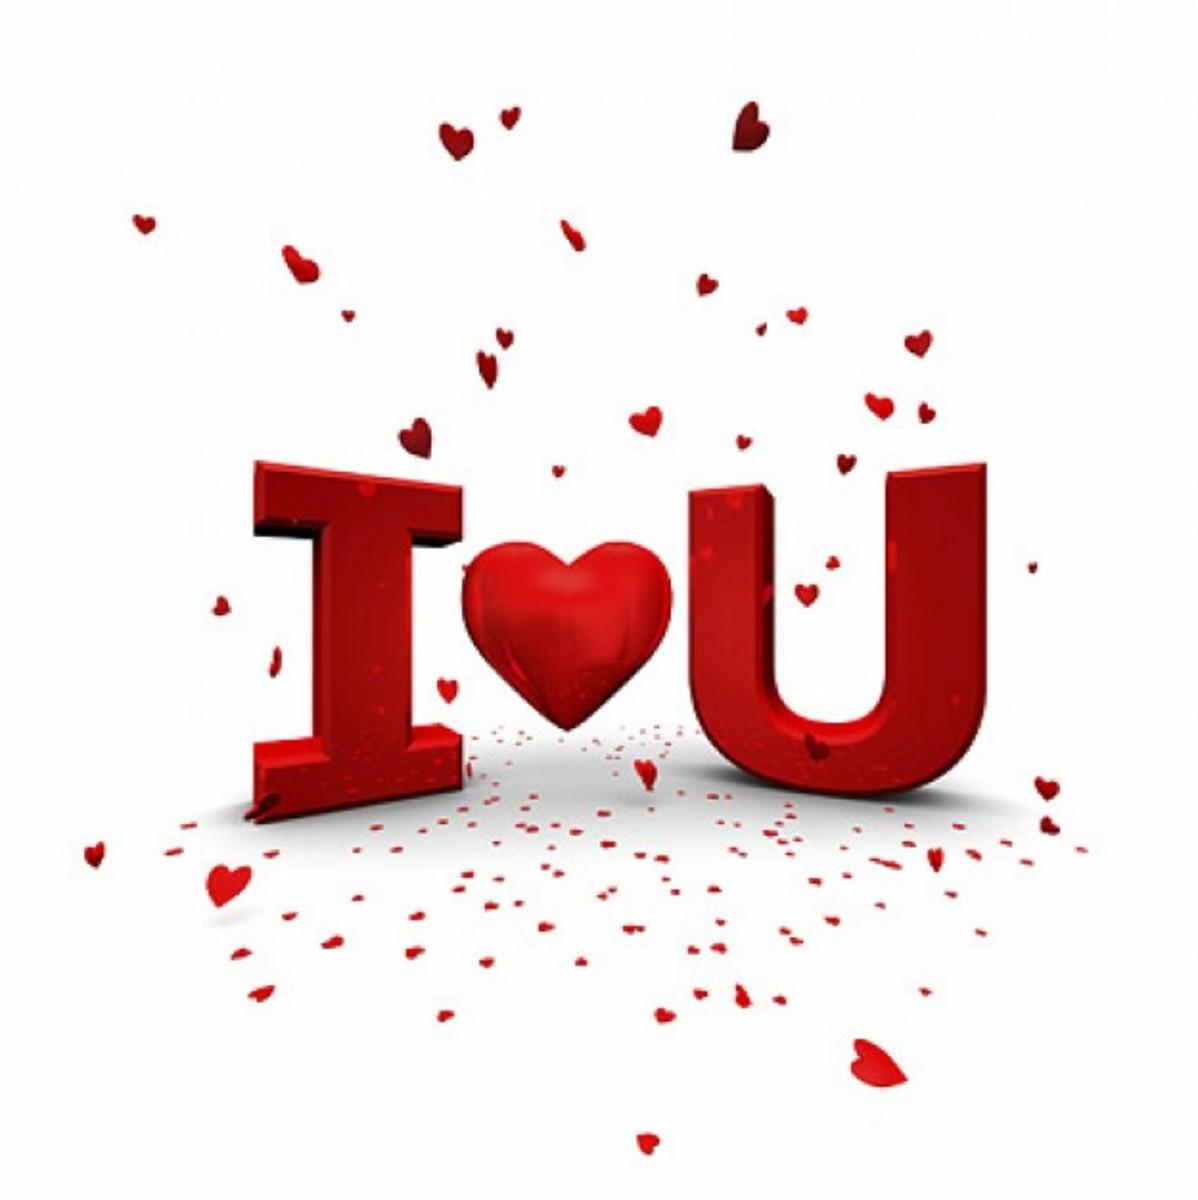 I ♥ U with Floating Hearts